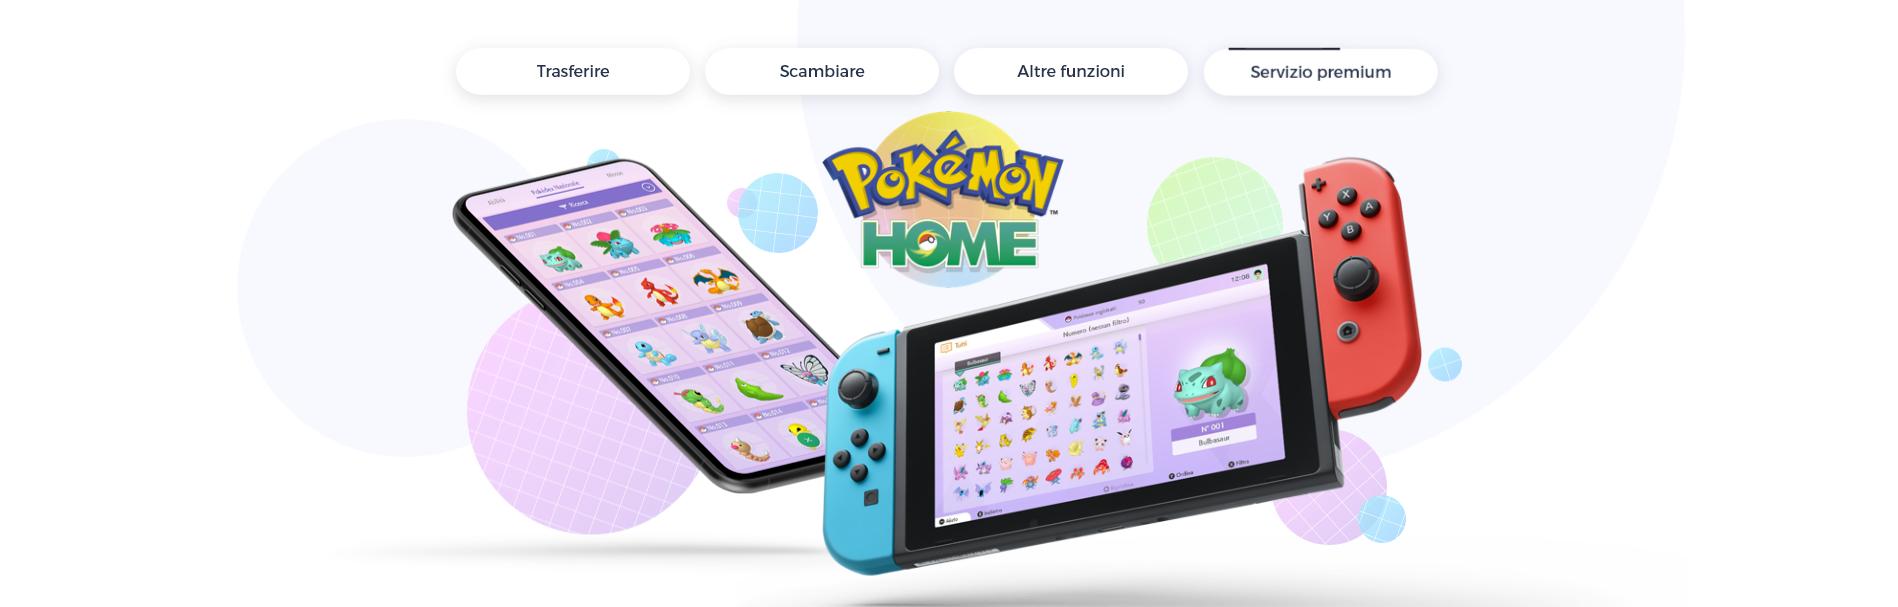 screenshot home.pokemon.com 2020.01.28 17 21 22